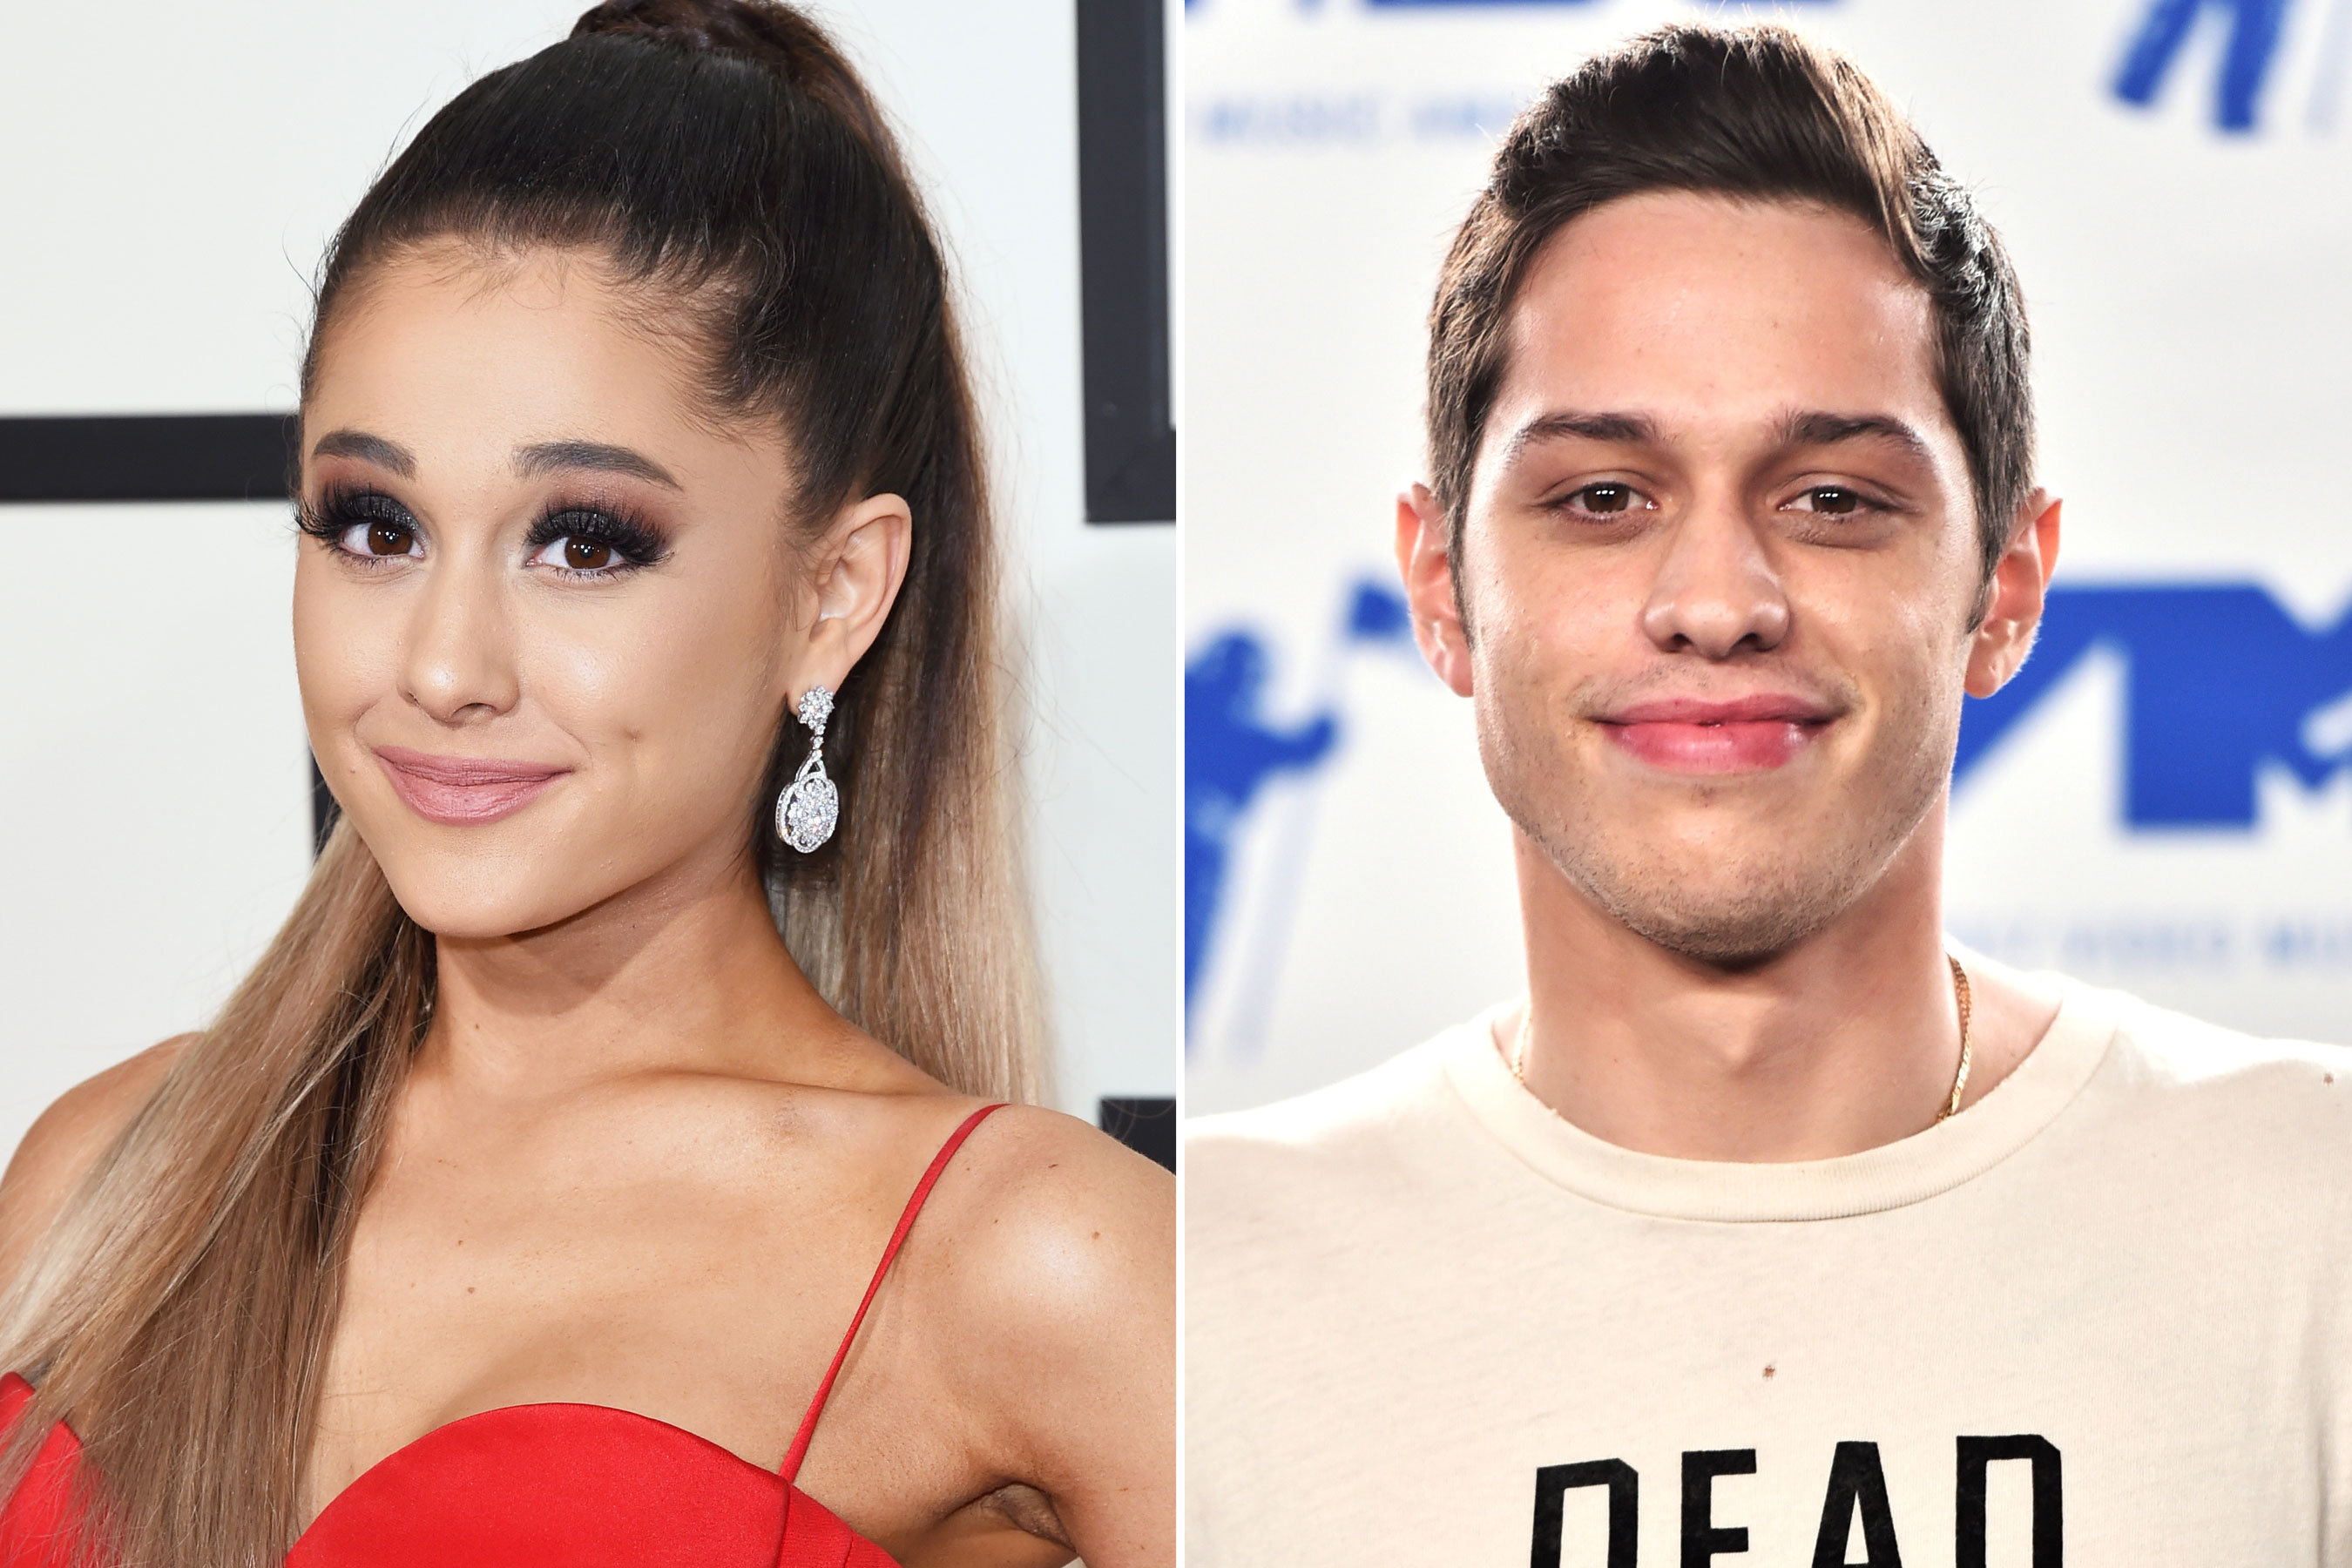 Pete Davidson blocked Ariana Grande after split